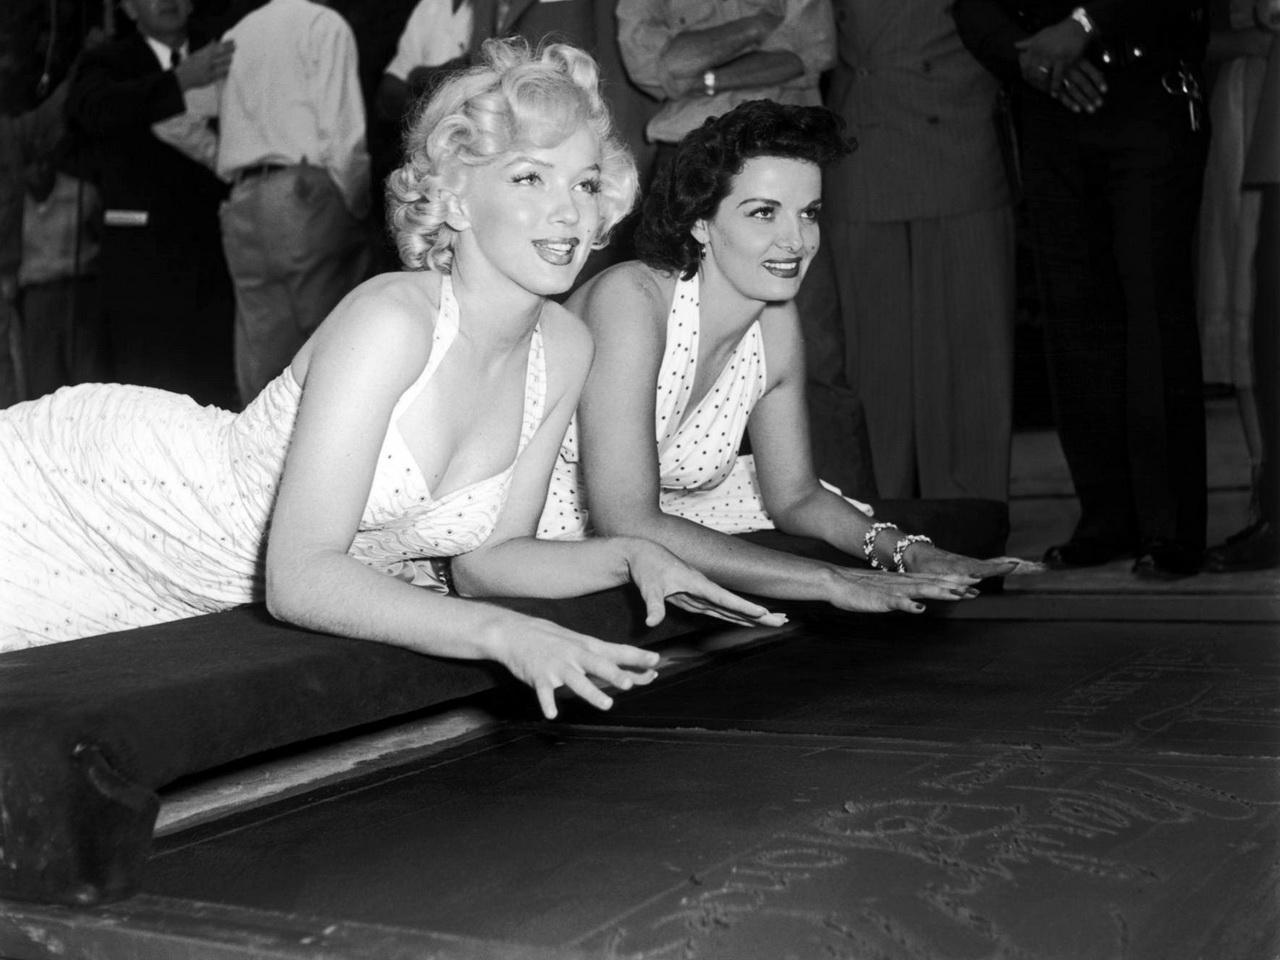 50249 descargar fondo de pantalla Personas, Chicas, Marilyn Monroe: protectores de pantalla e imágenes gratis